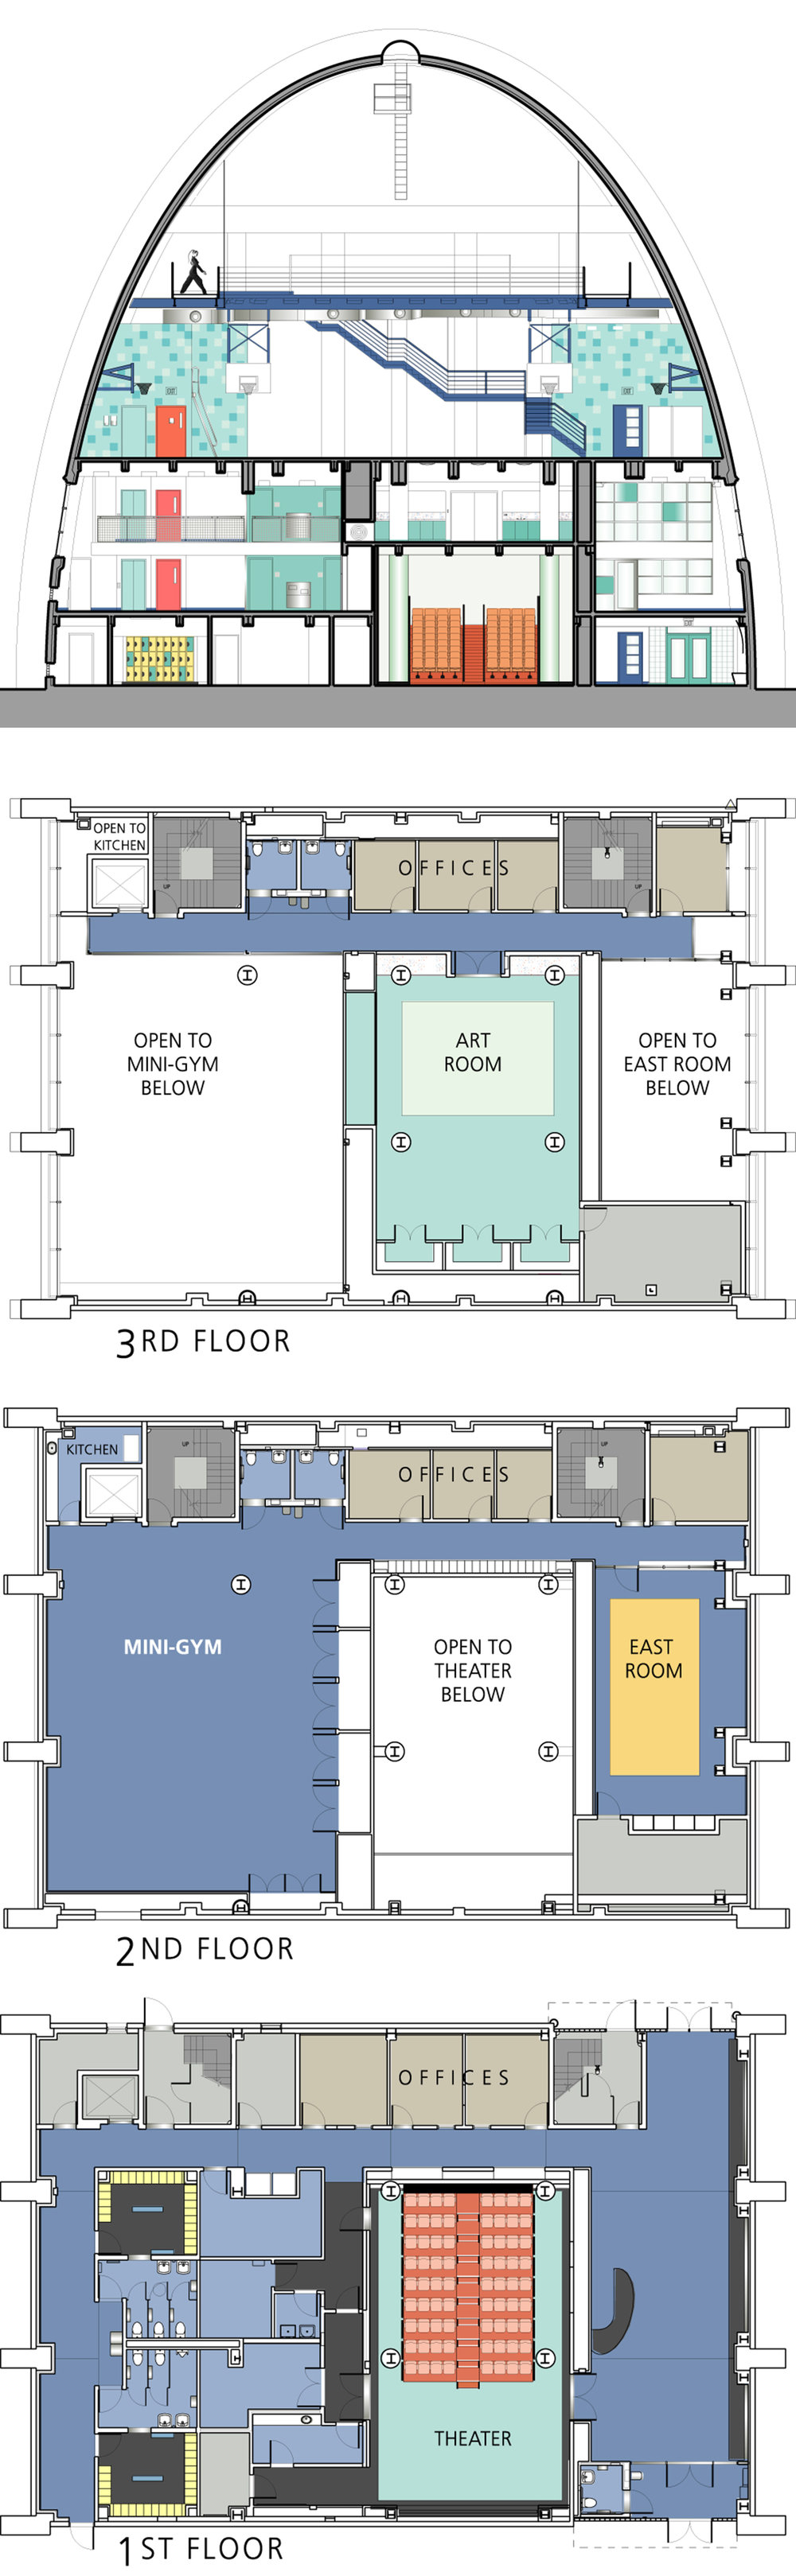 Building section; floor plans